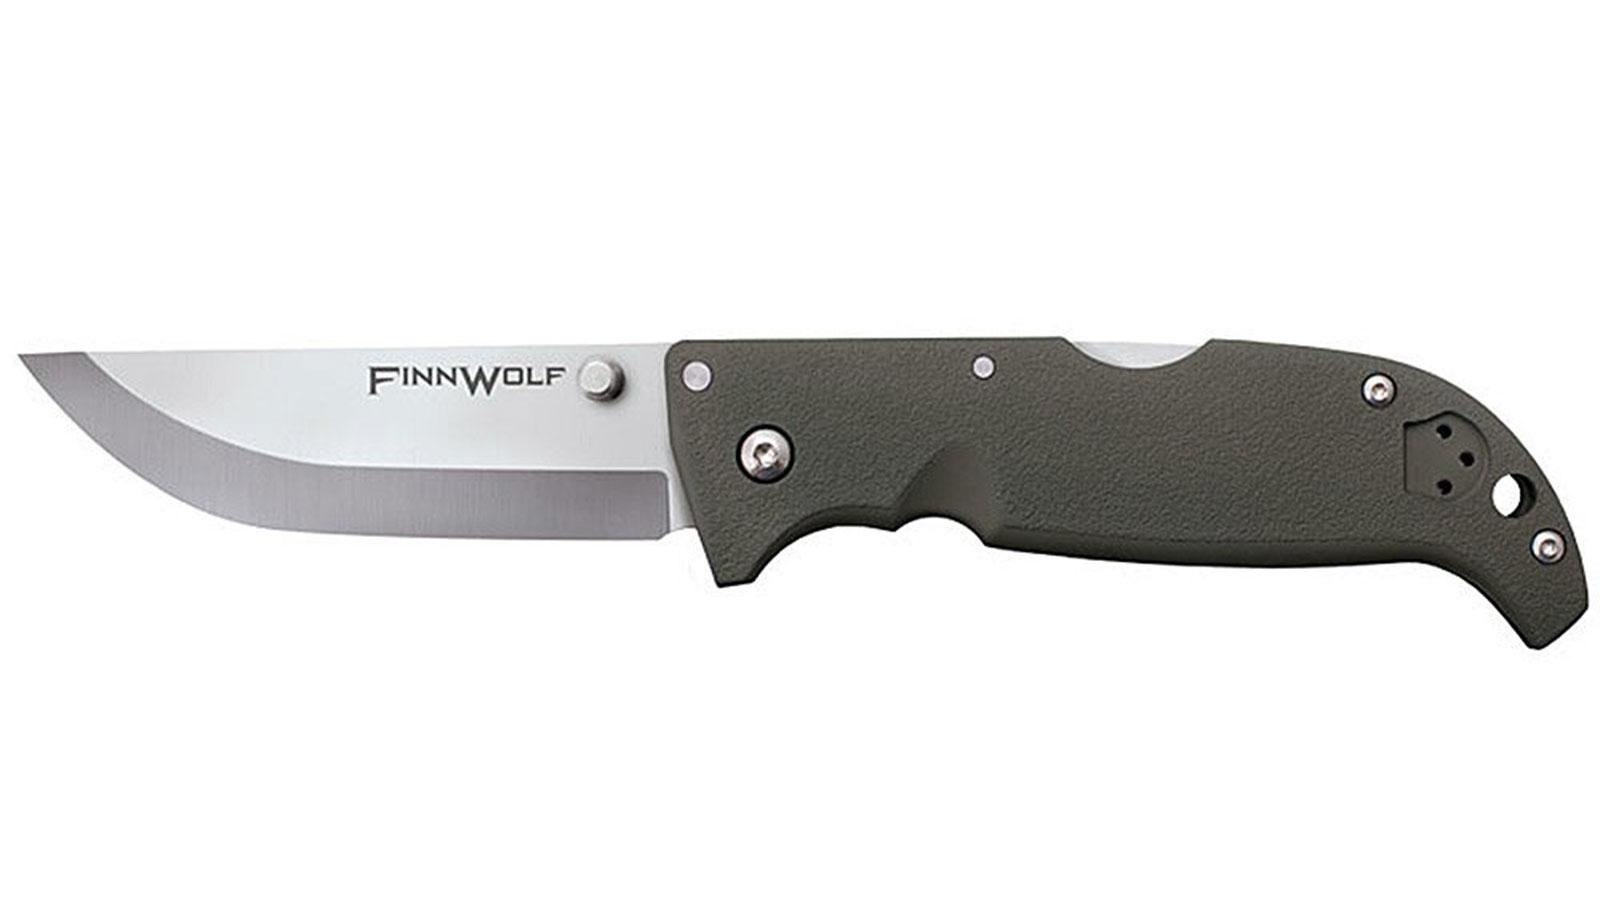 Cold Steel Finn Wolf Folding Pocket Knife | best EDC pocket knife